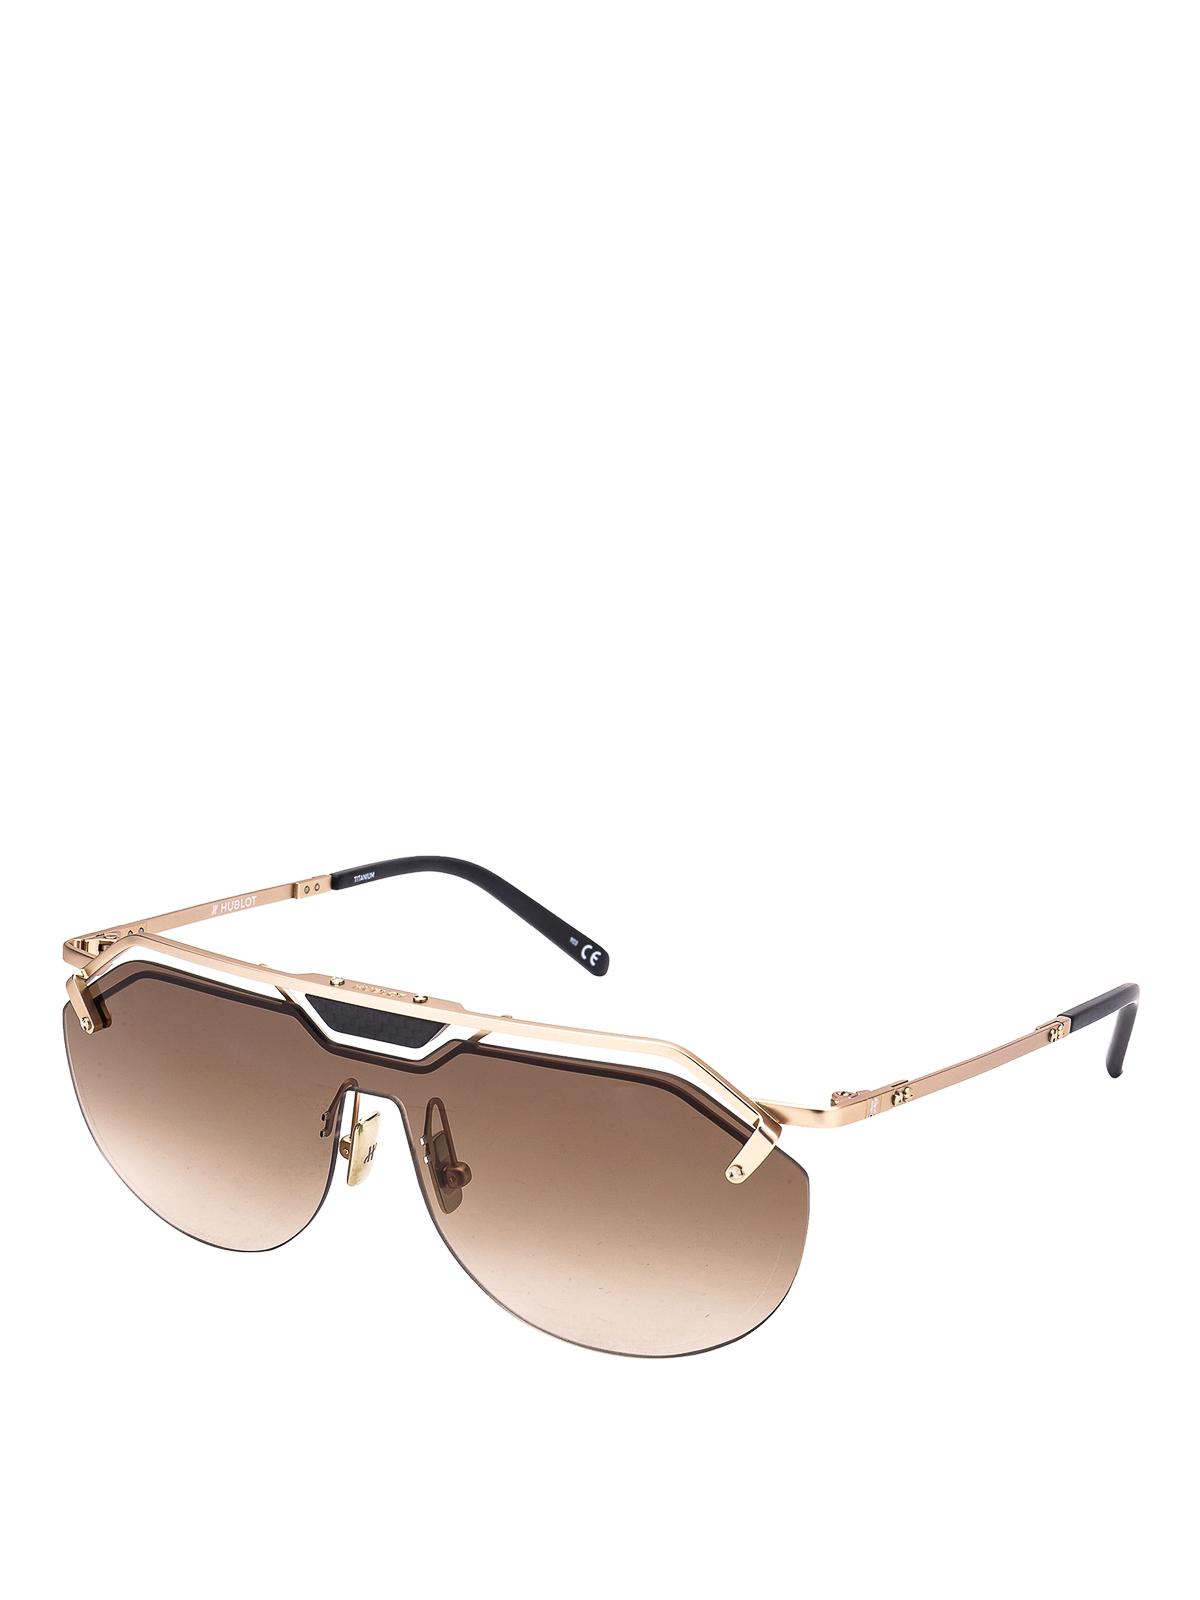 Hublot Gold-Tone Titanium Mask Sunglasses